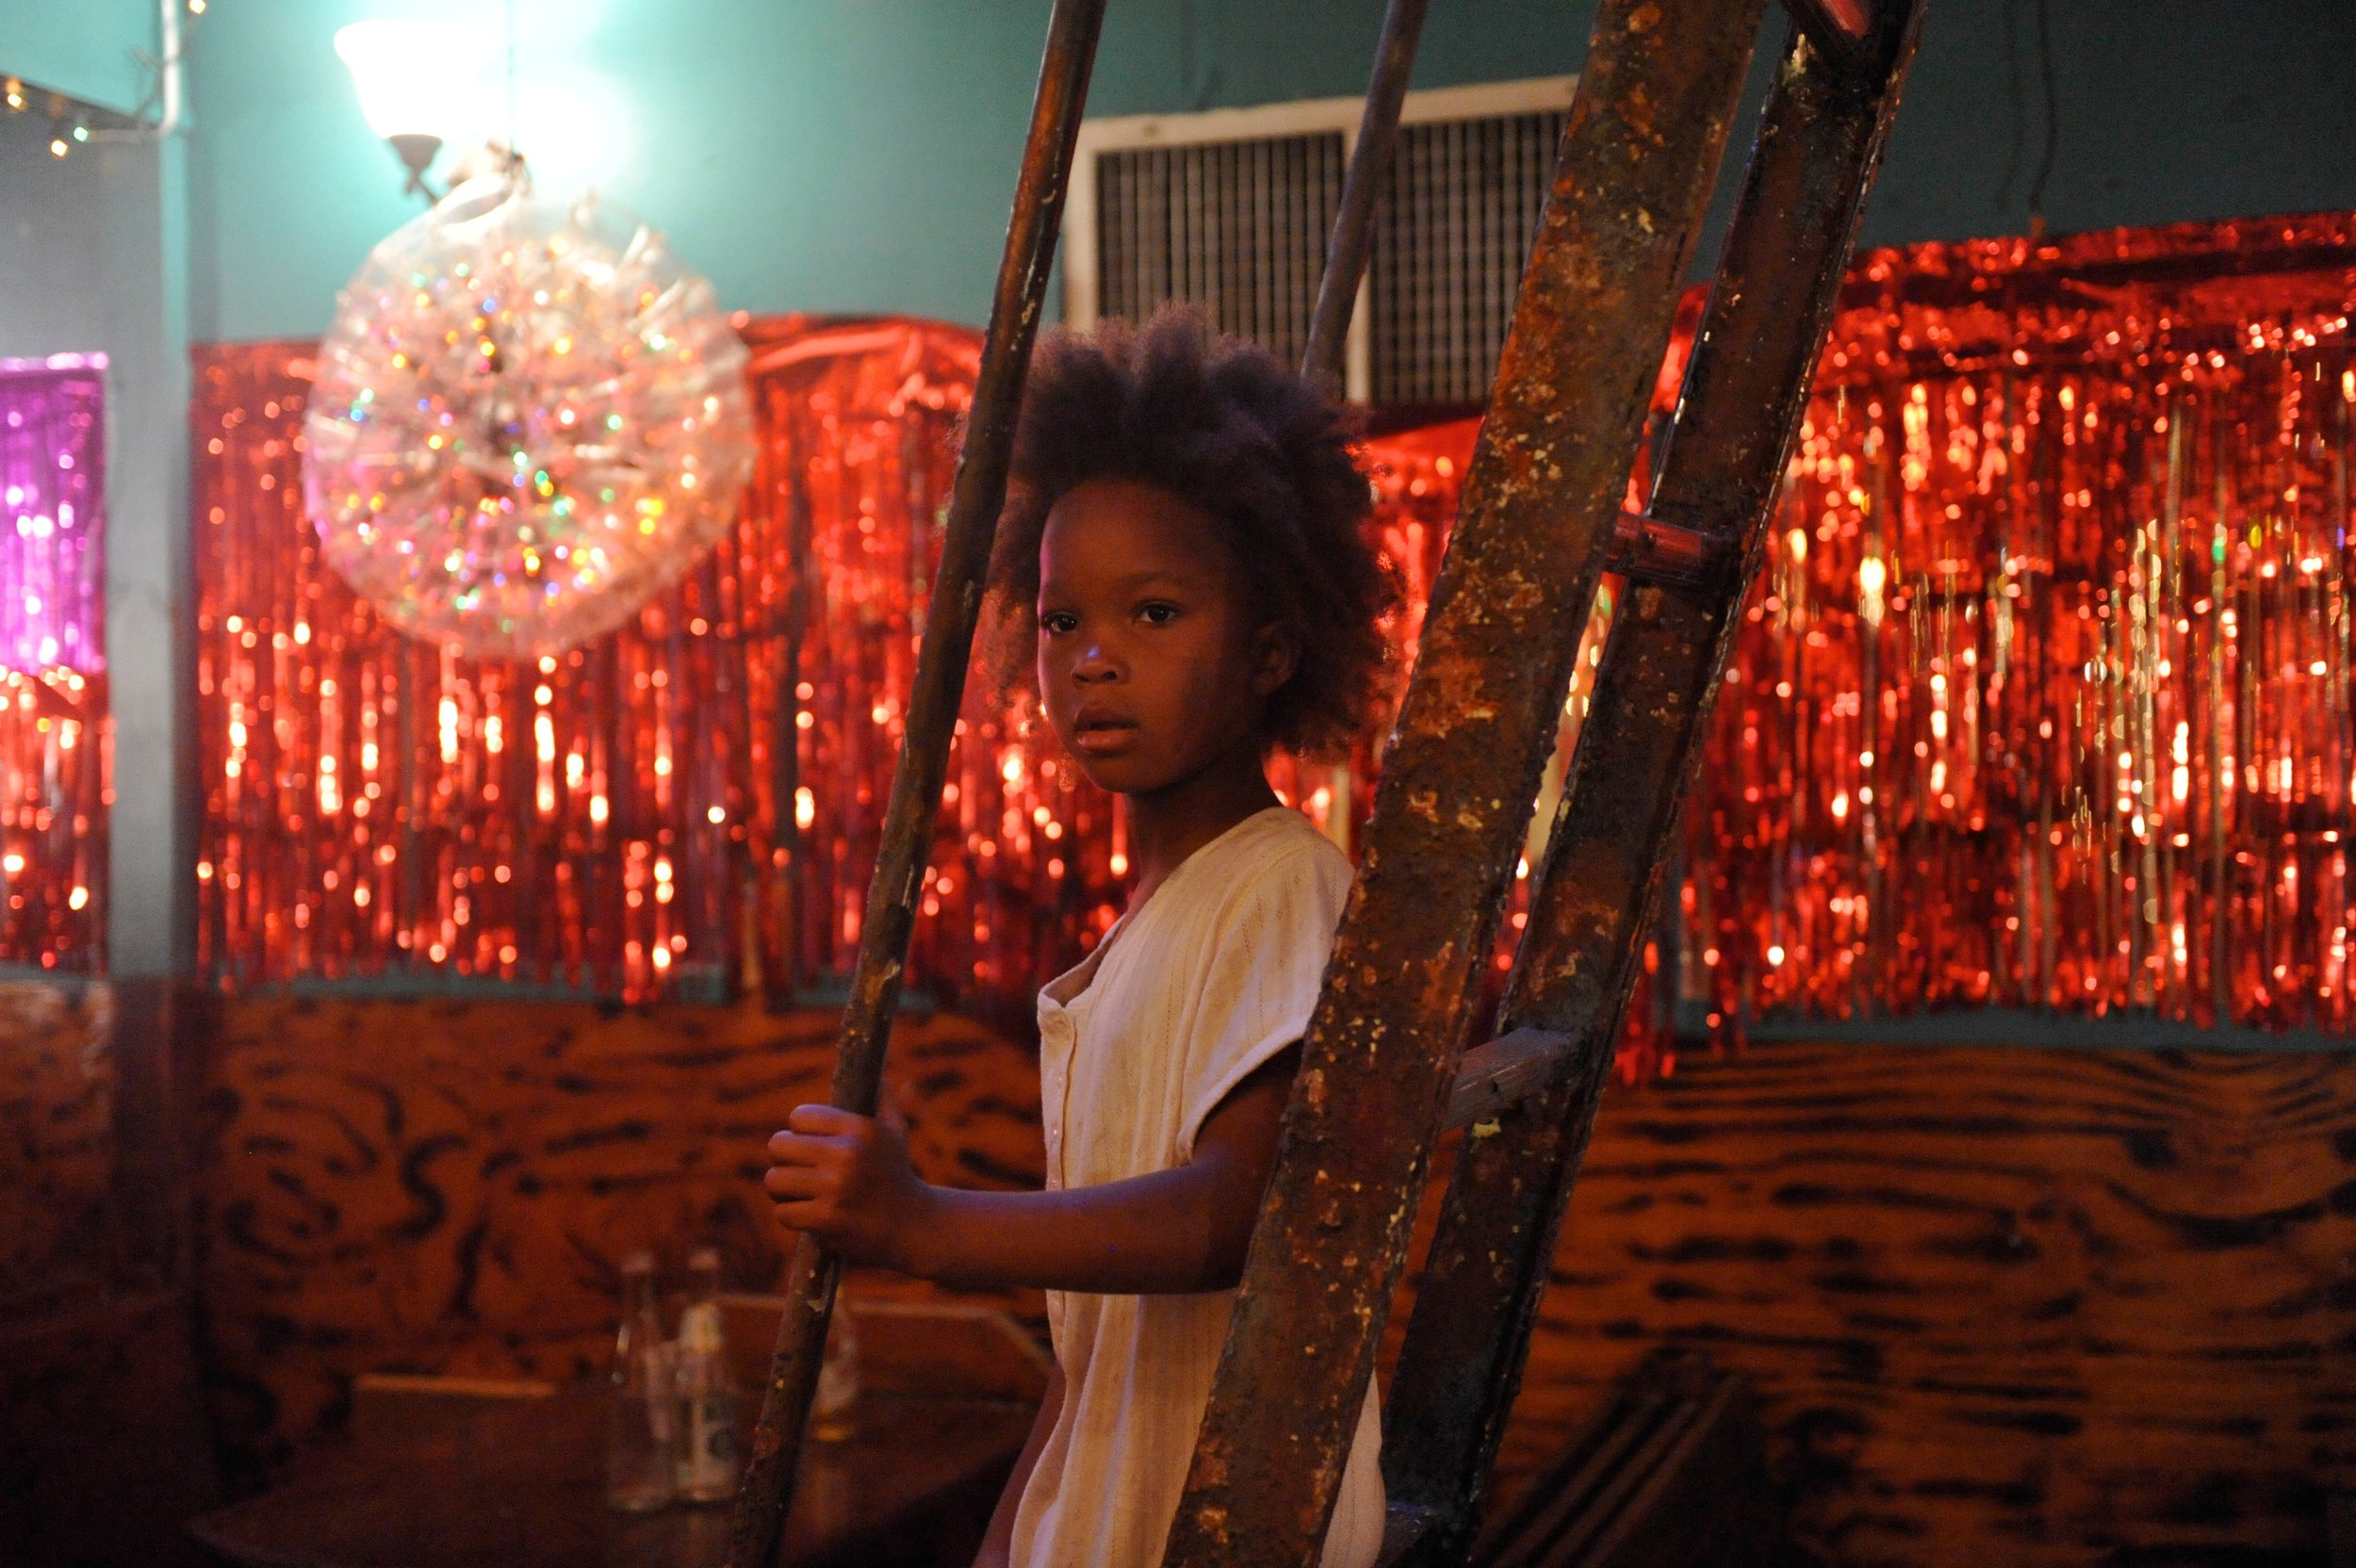 9 år gamle Quvenzhané Wallis i rollen som Hushpuppy i filmen  Beasts of the Southern Wild  (2012).